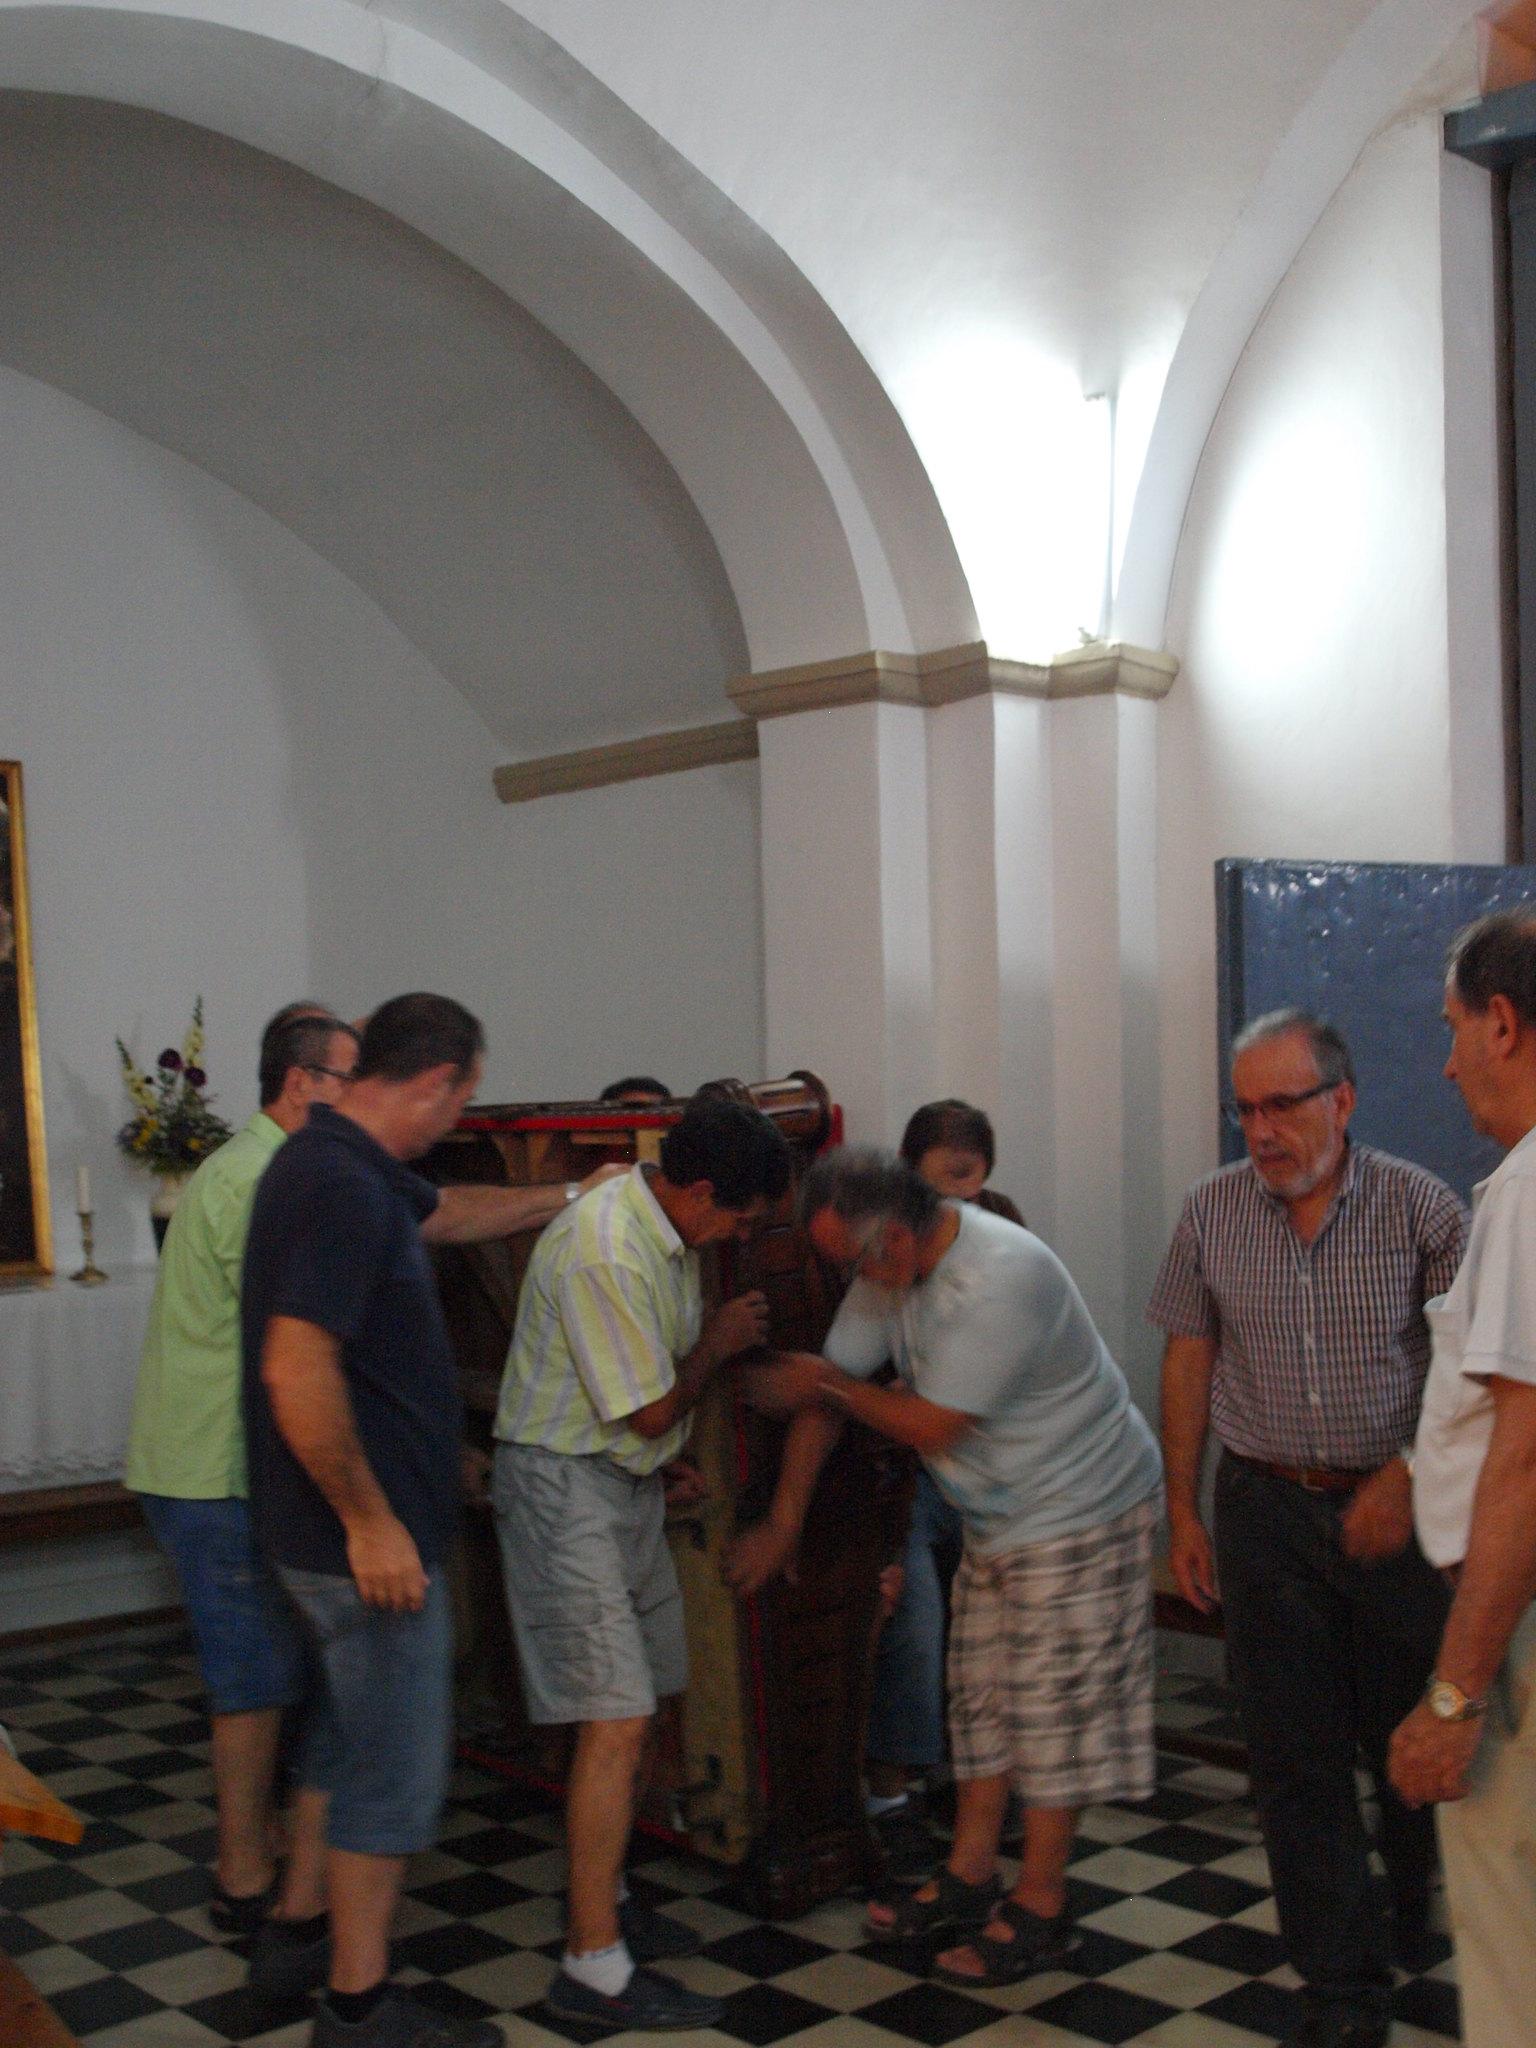 (2014-07-07) - Recogida de Imagen - Paloma Romero Torralba (105)